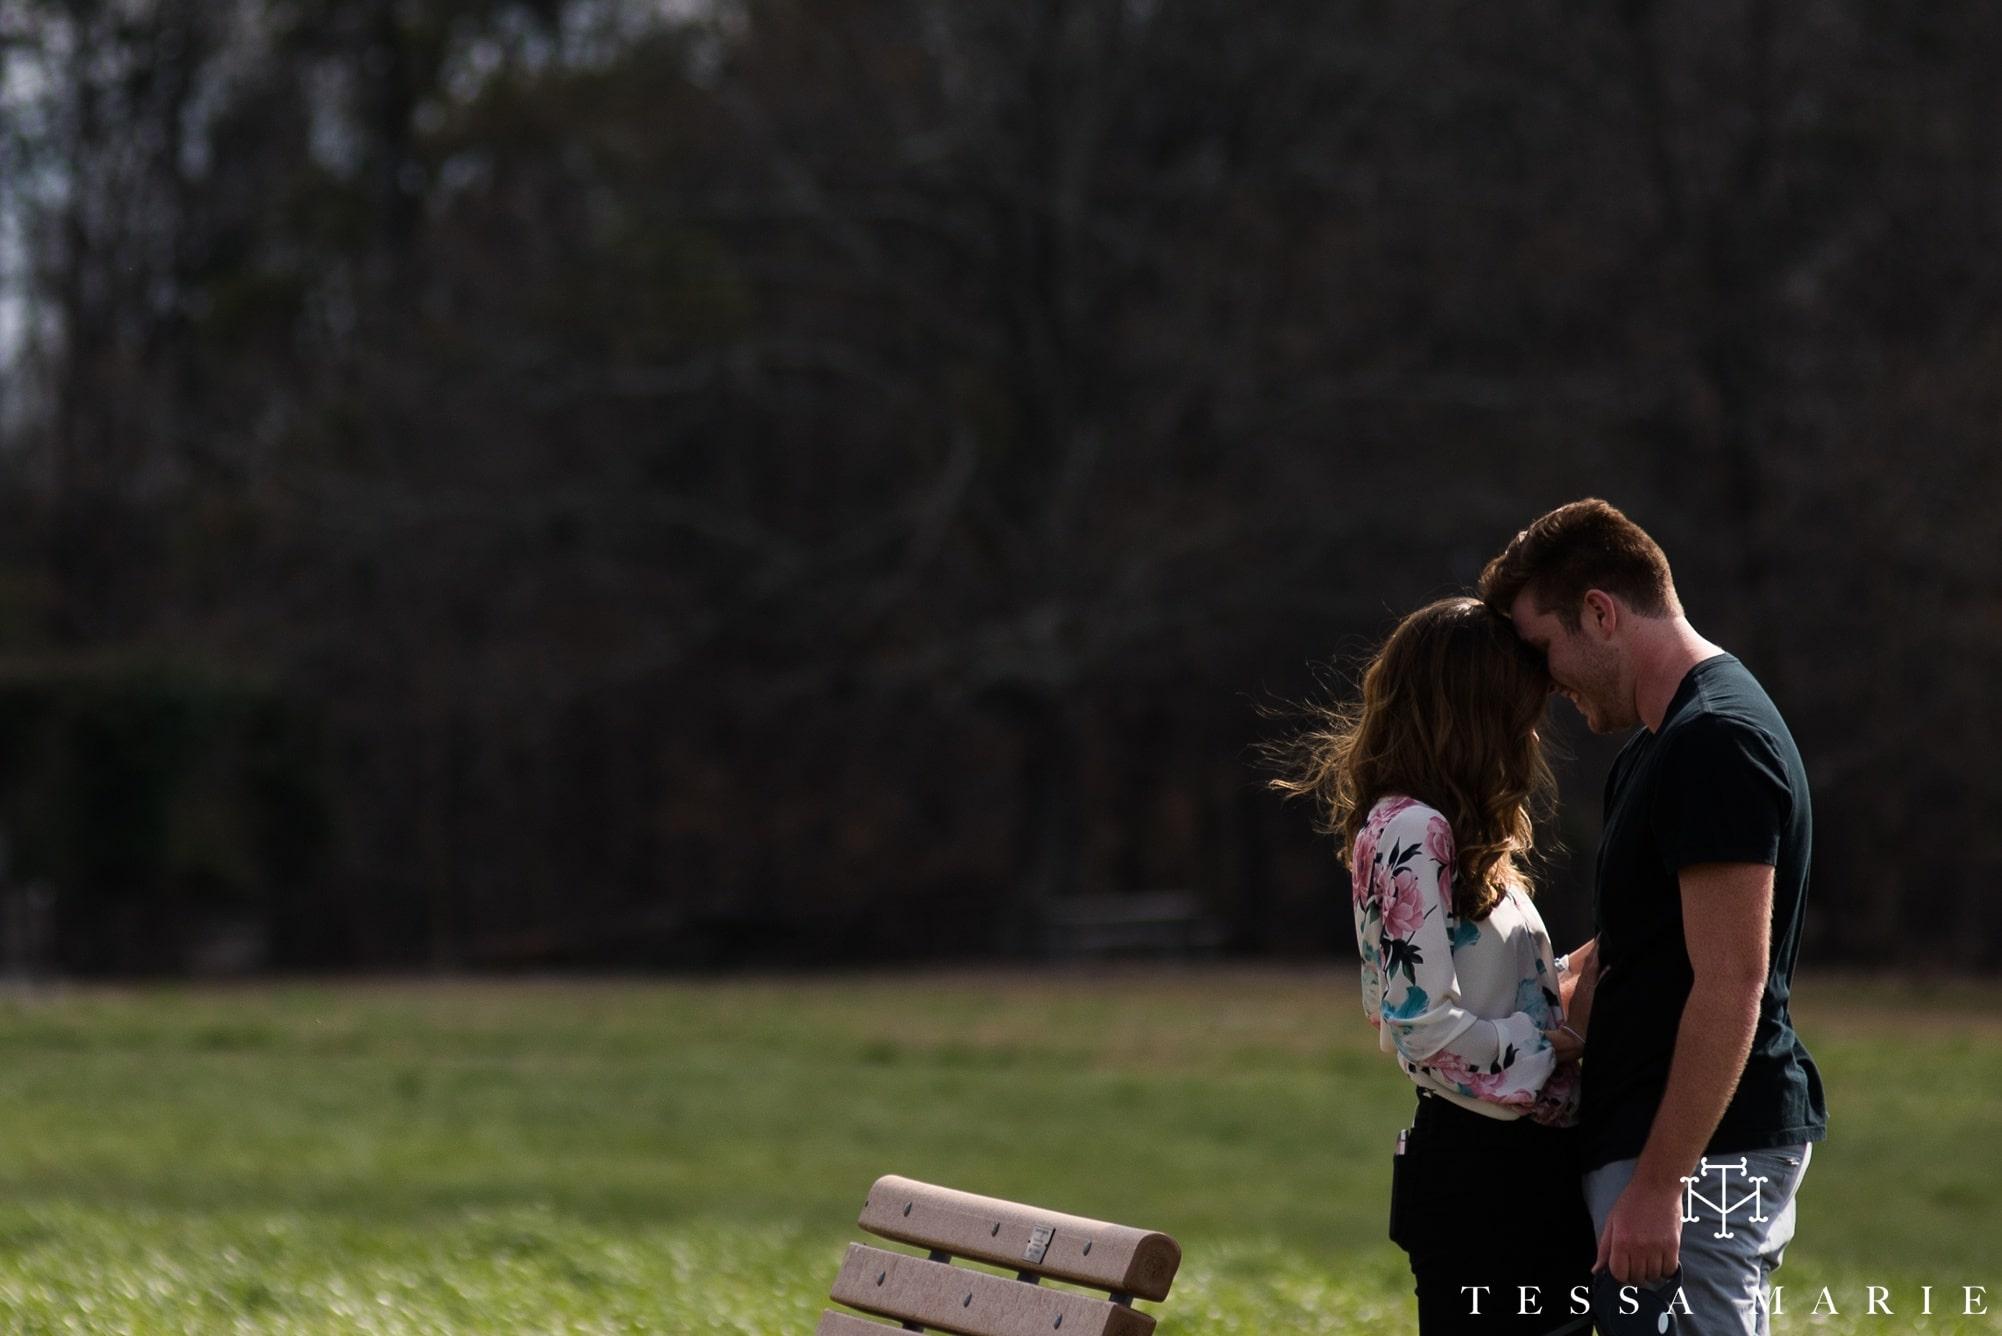 tessa_marie_studios_tessa_marie_weddings_proposal_atlanta_engagement_pictures_0047